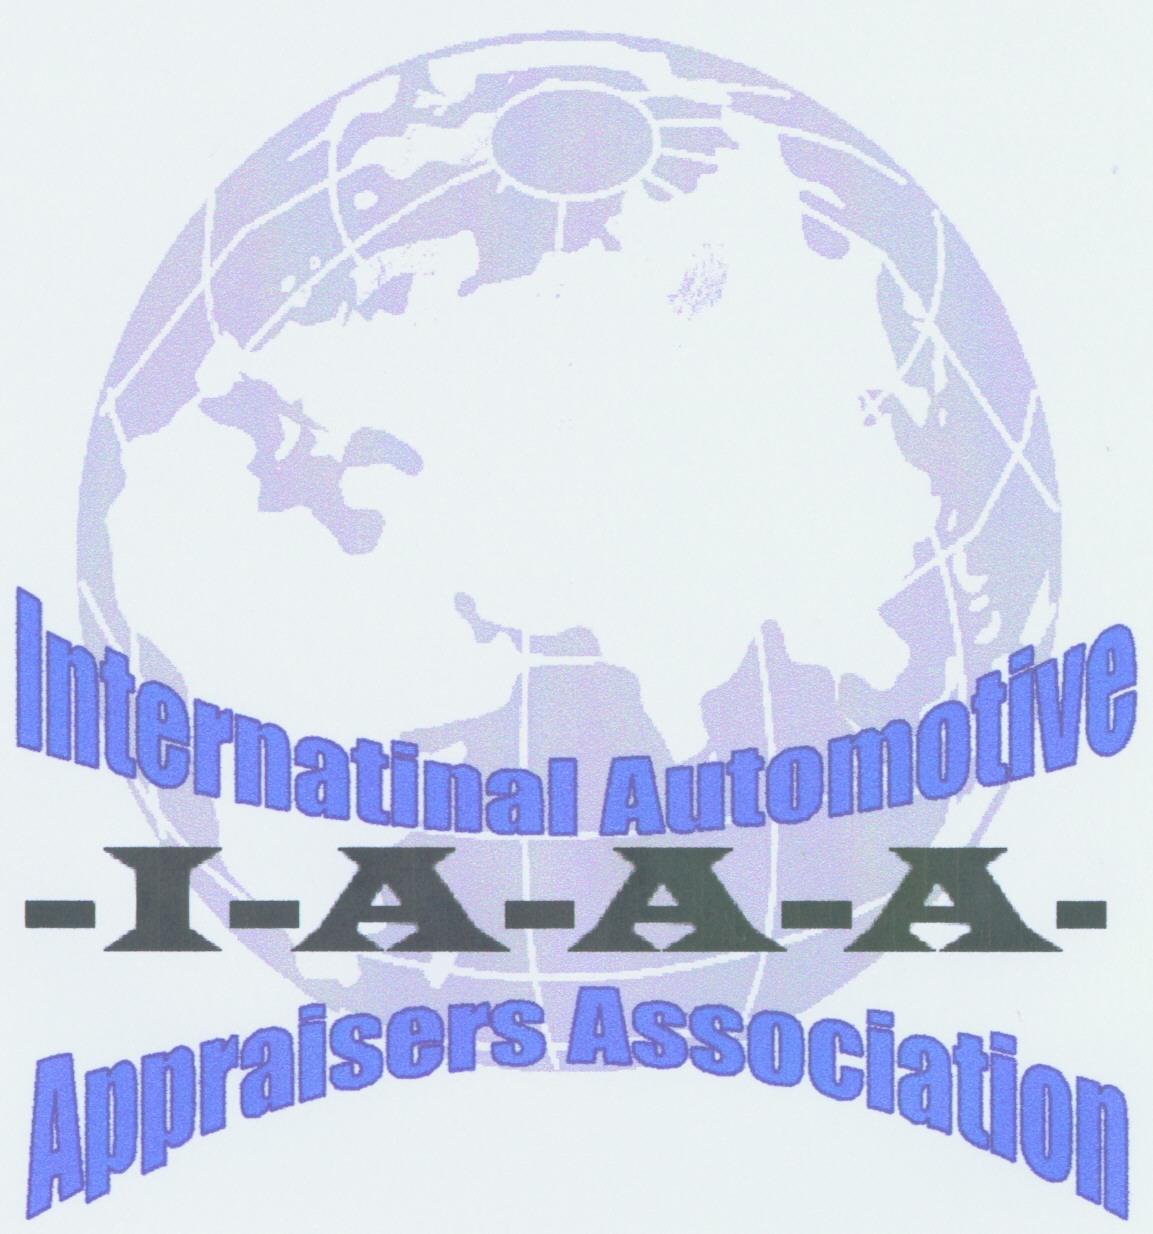 logo for International Automotive Appraisers Association